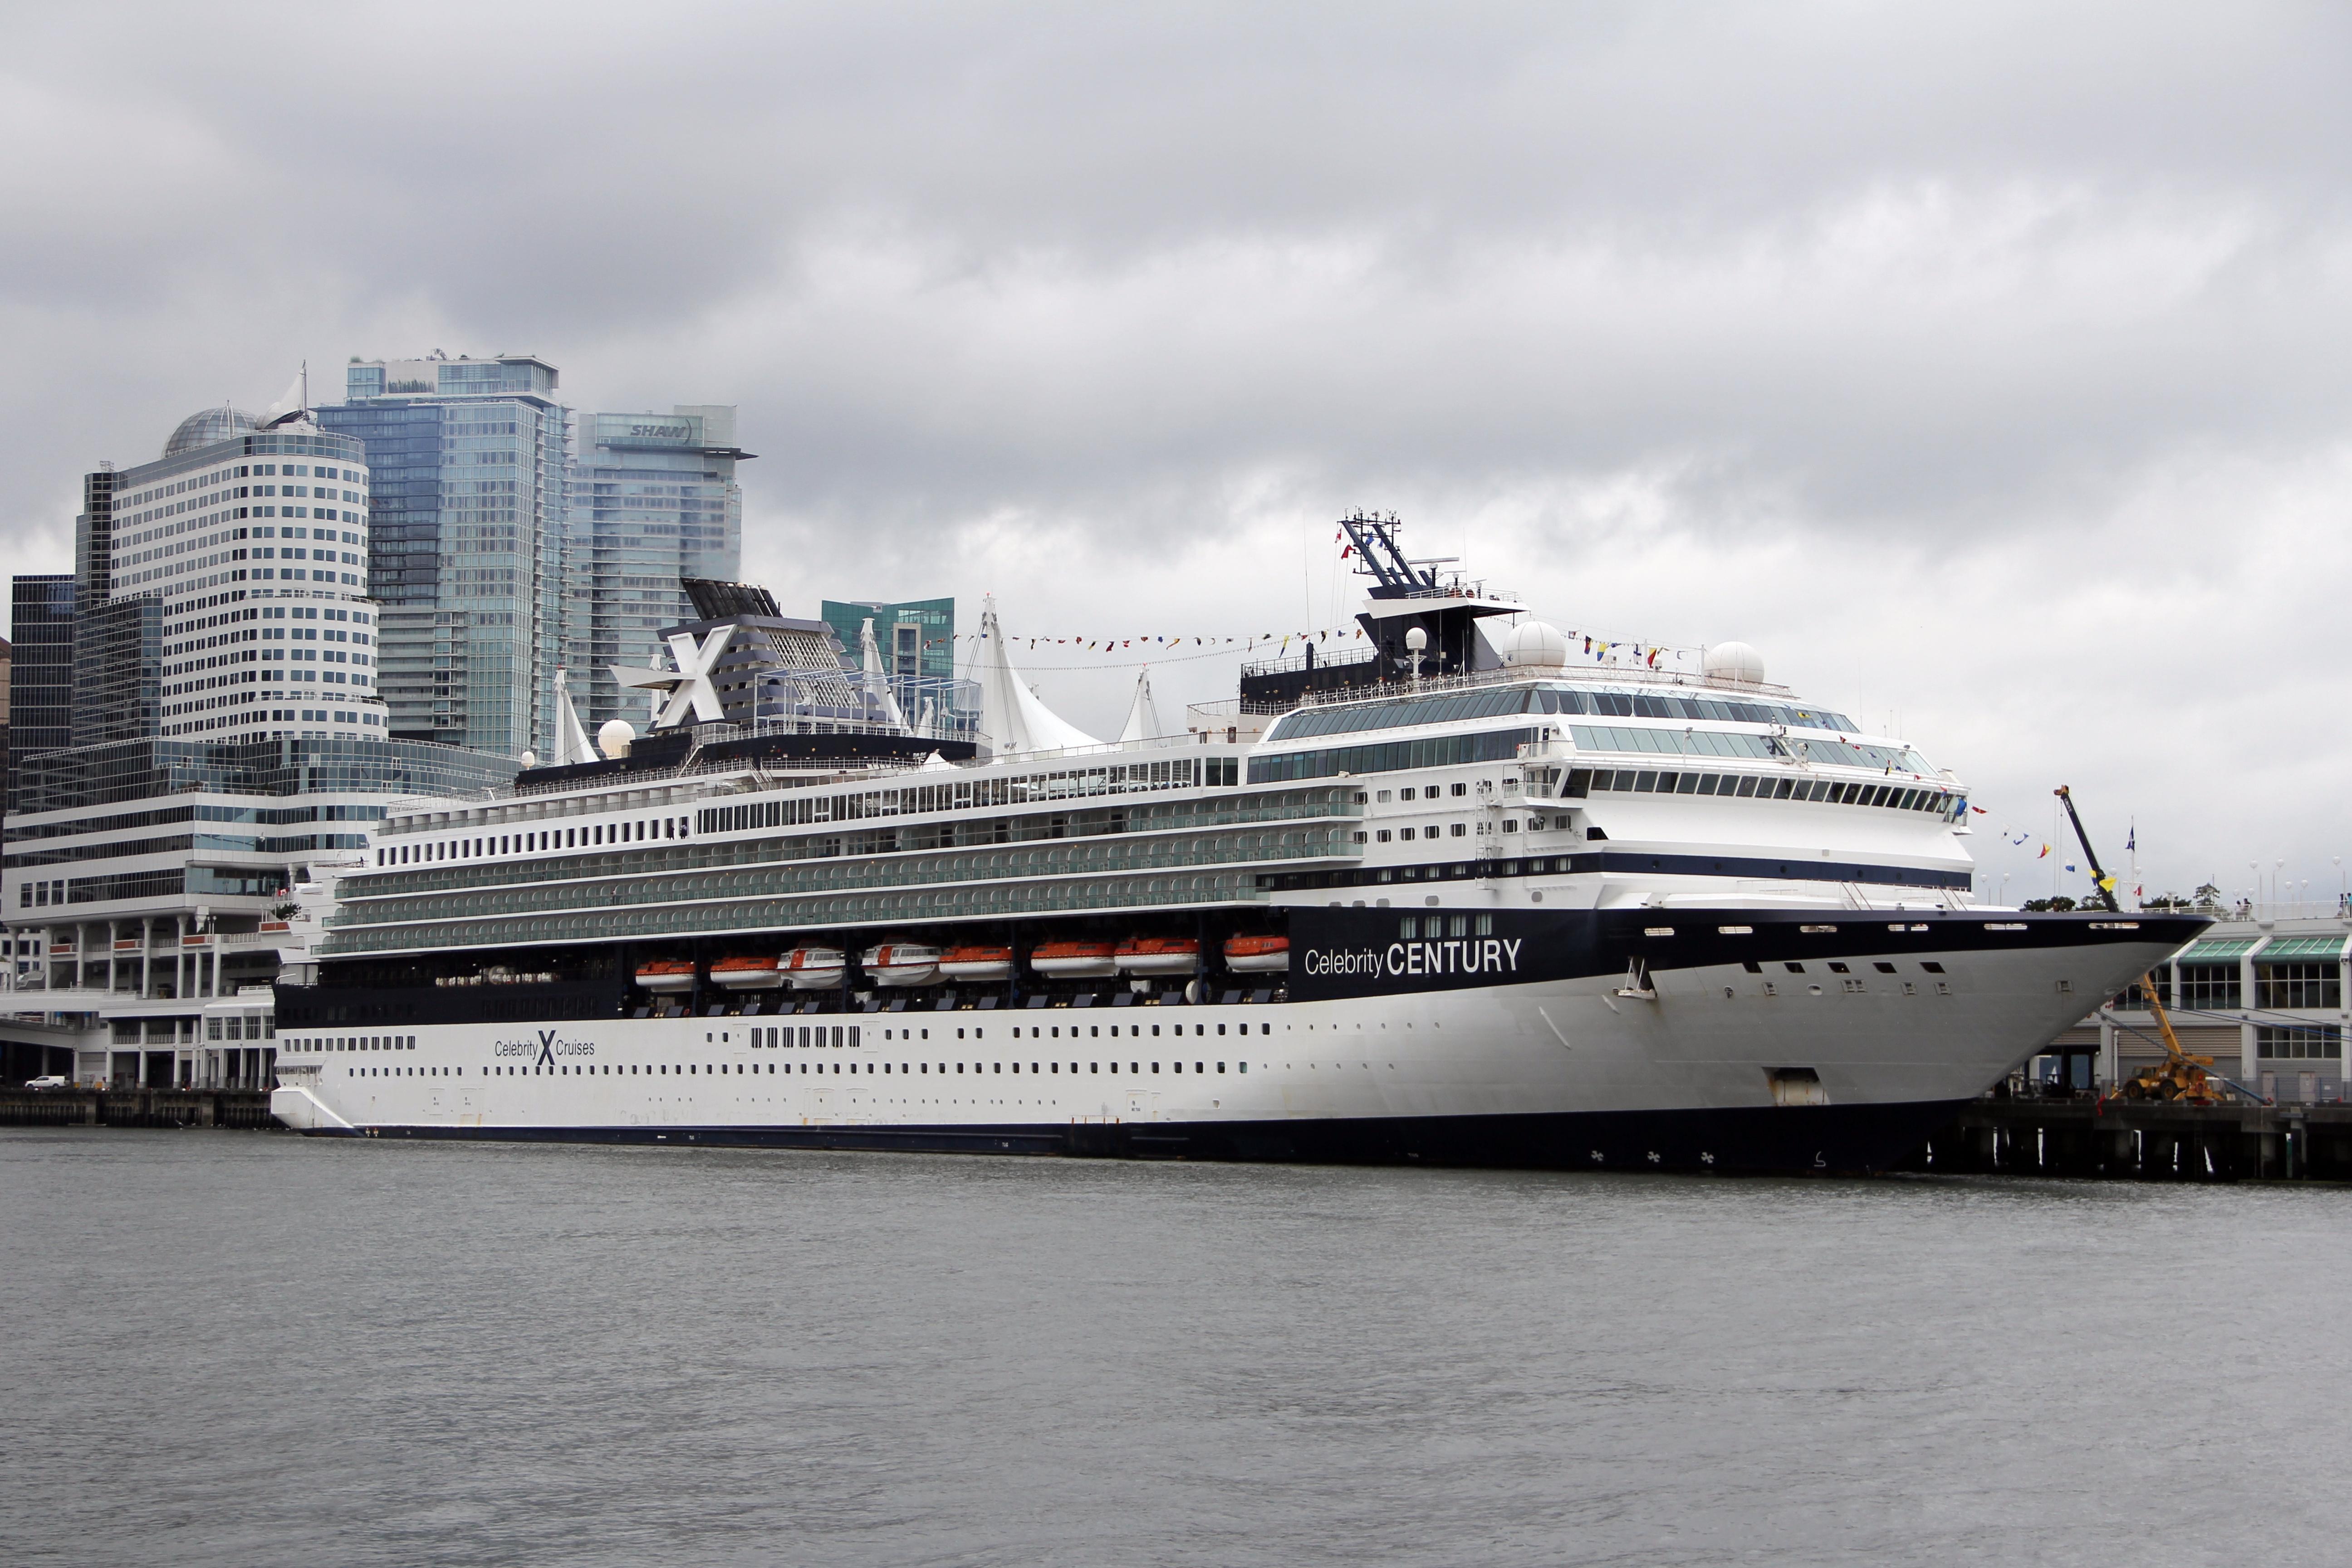 riley cruise